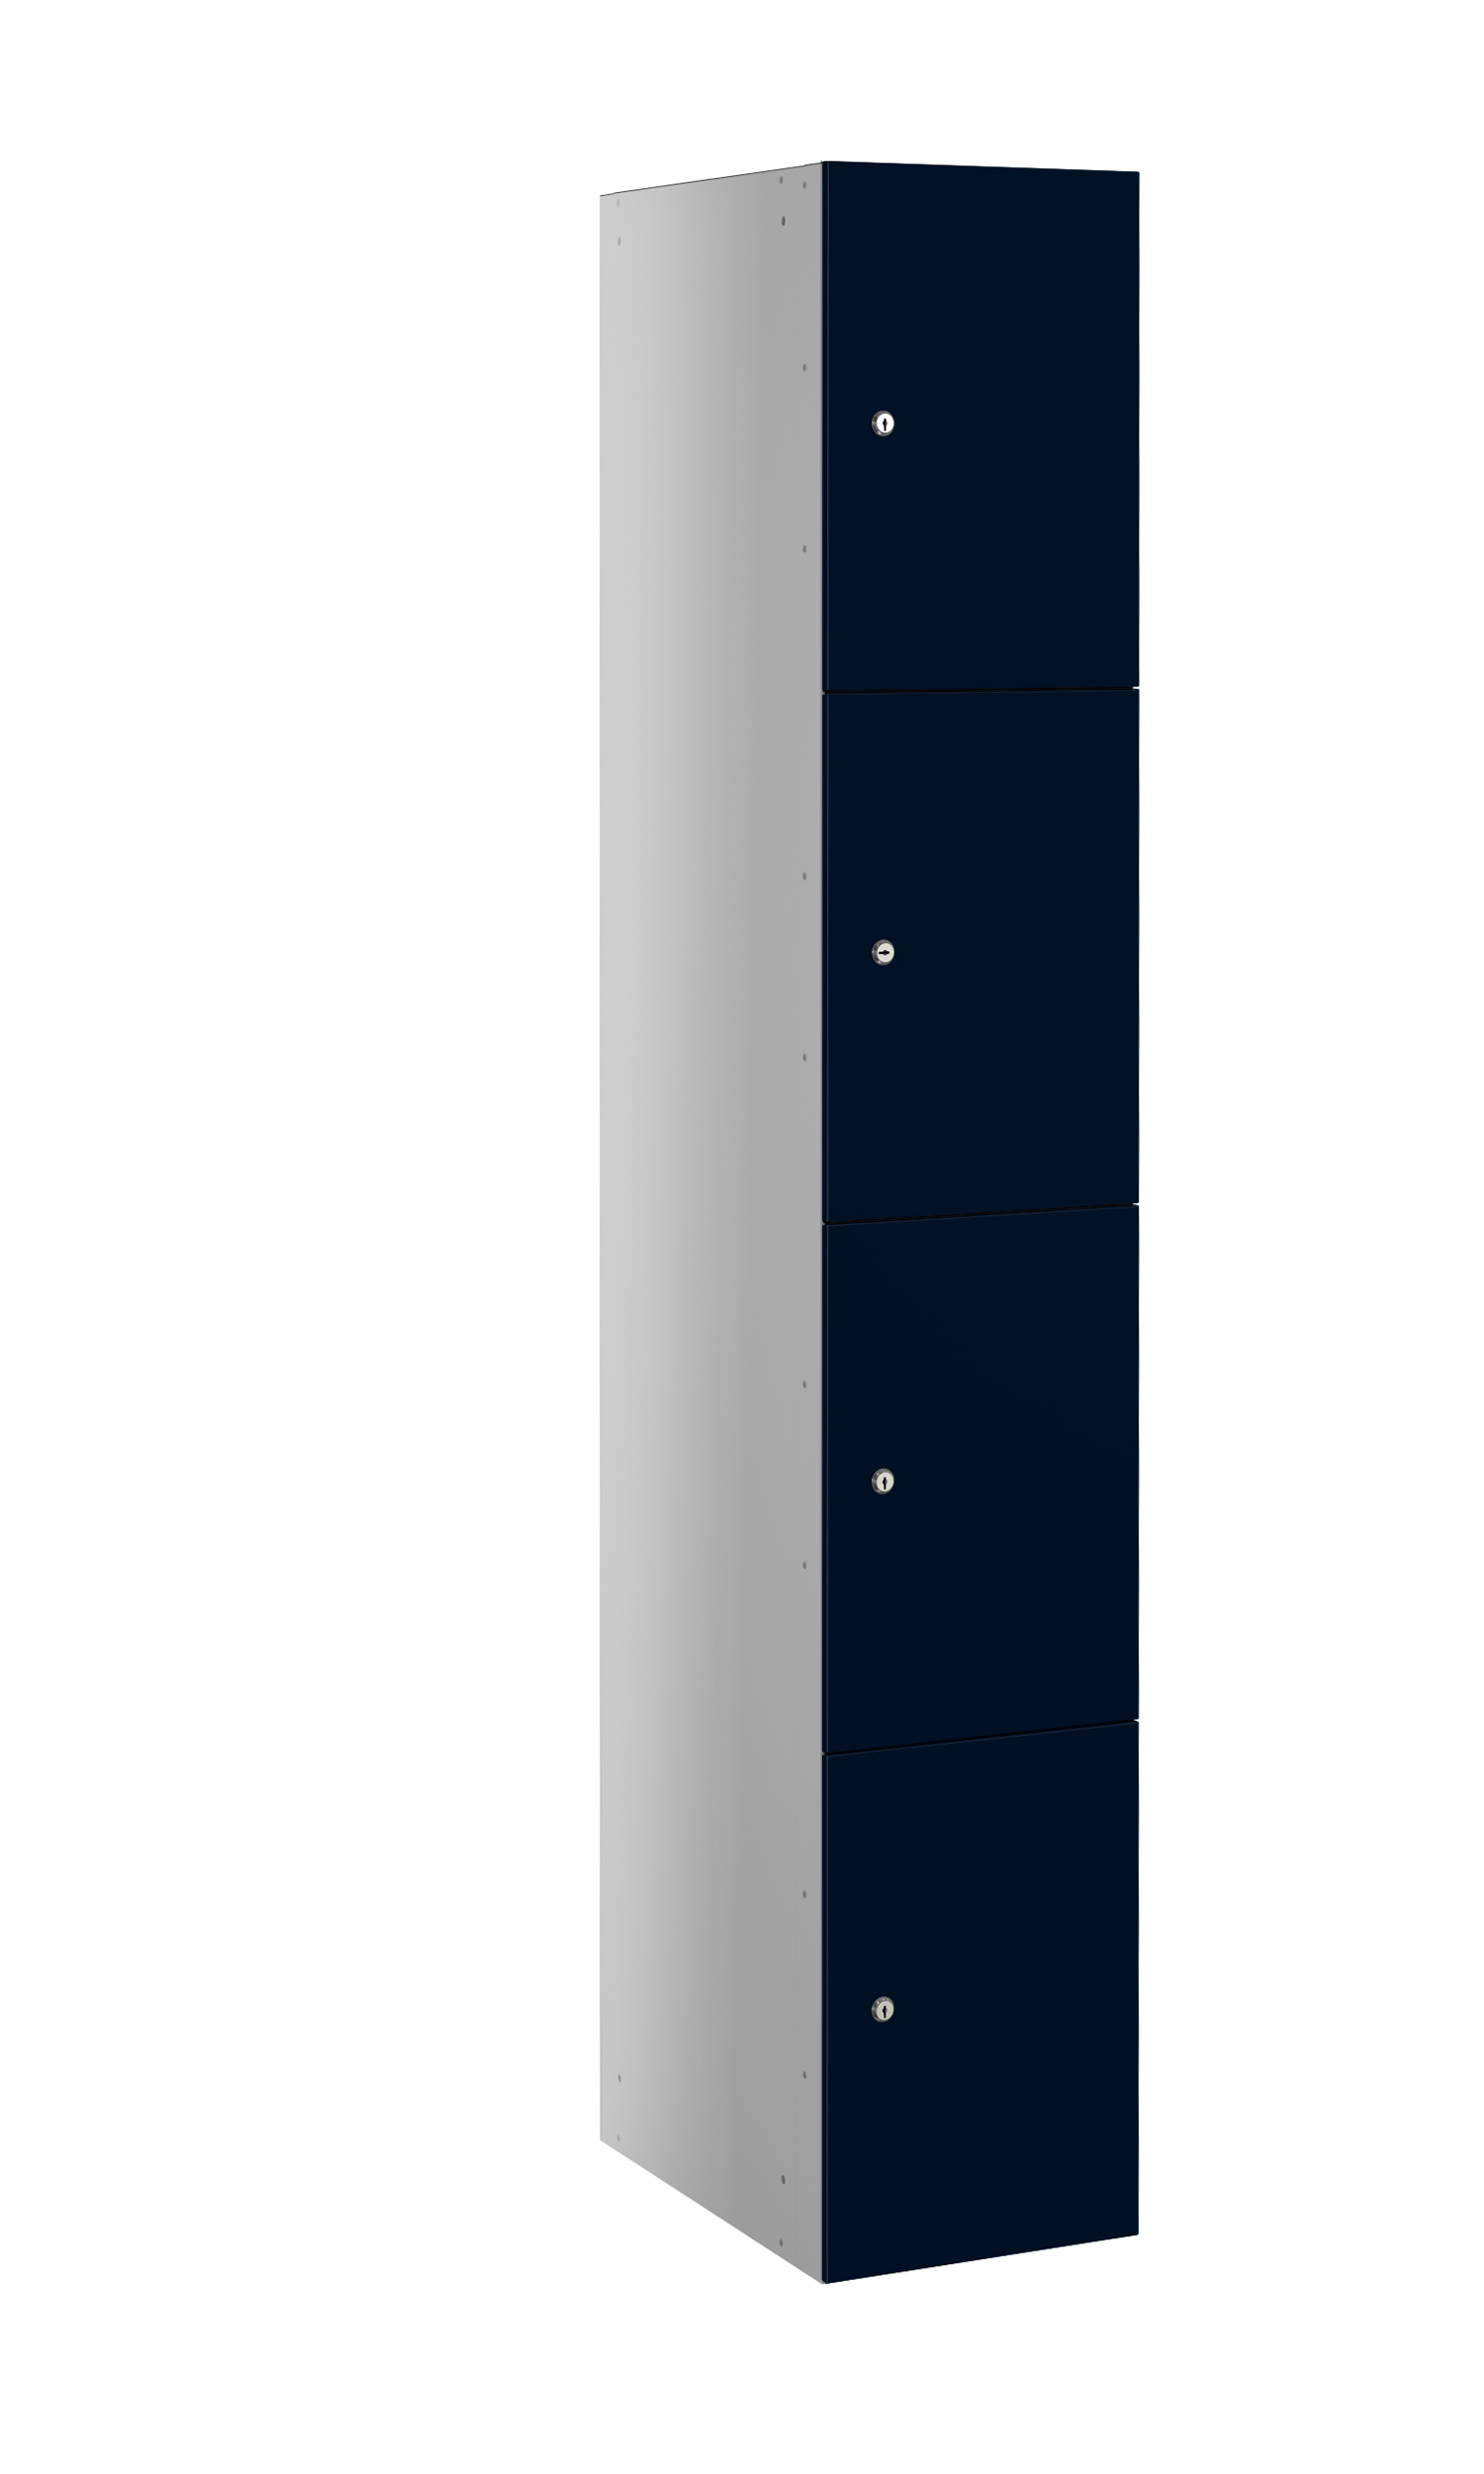 Probe buzzbox laminate 4 doors blue